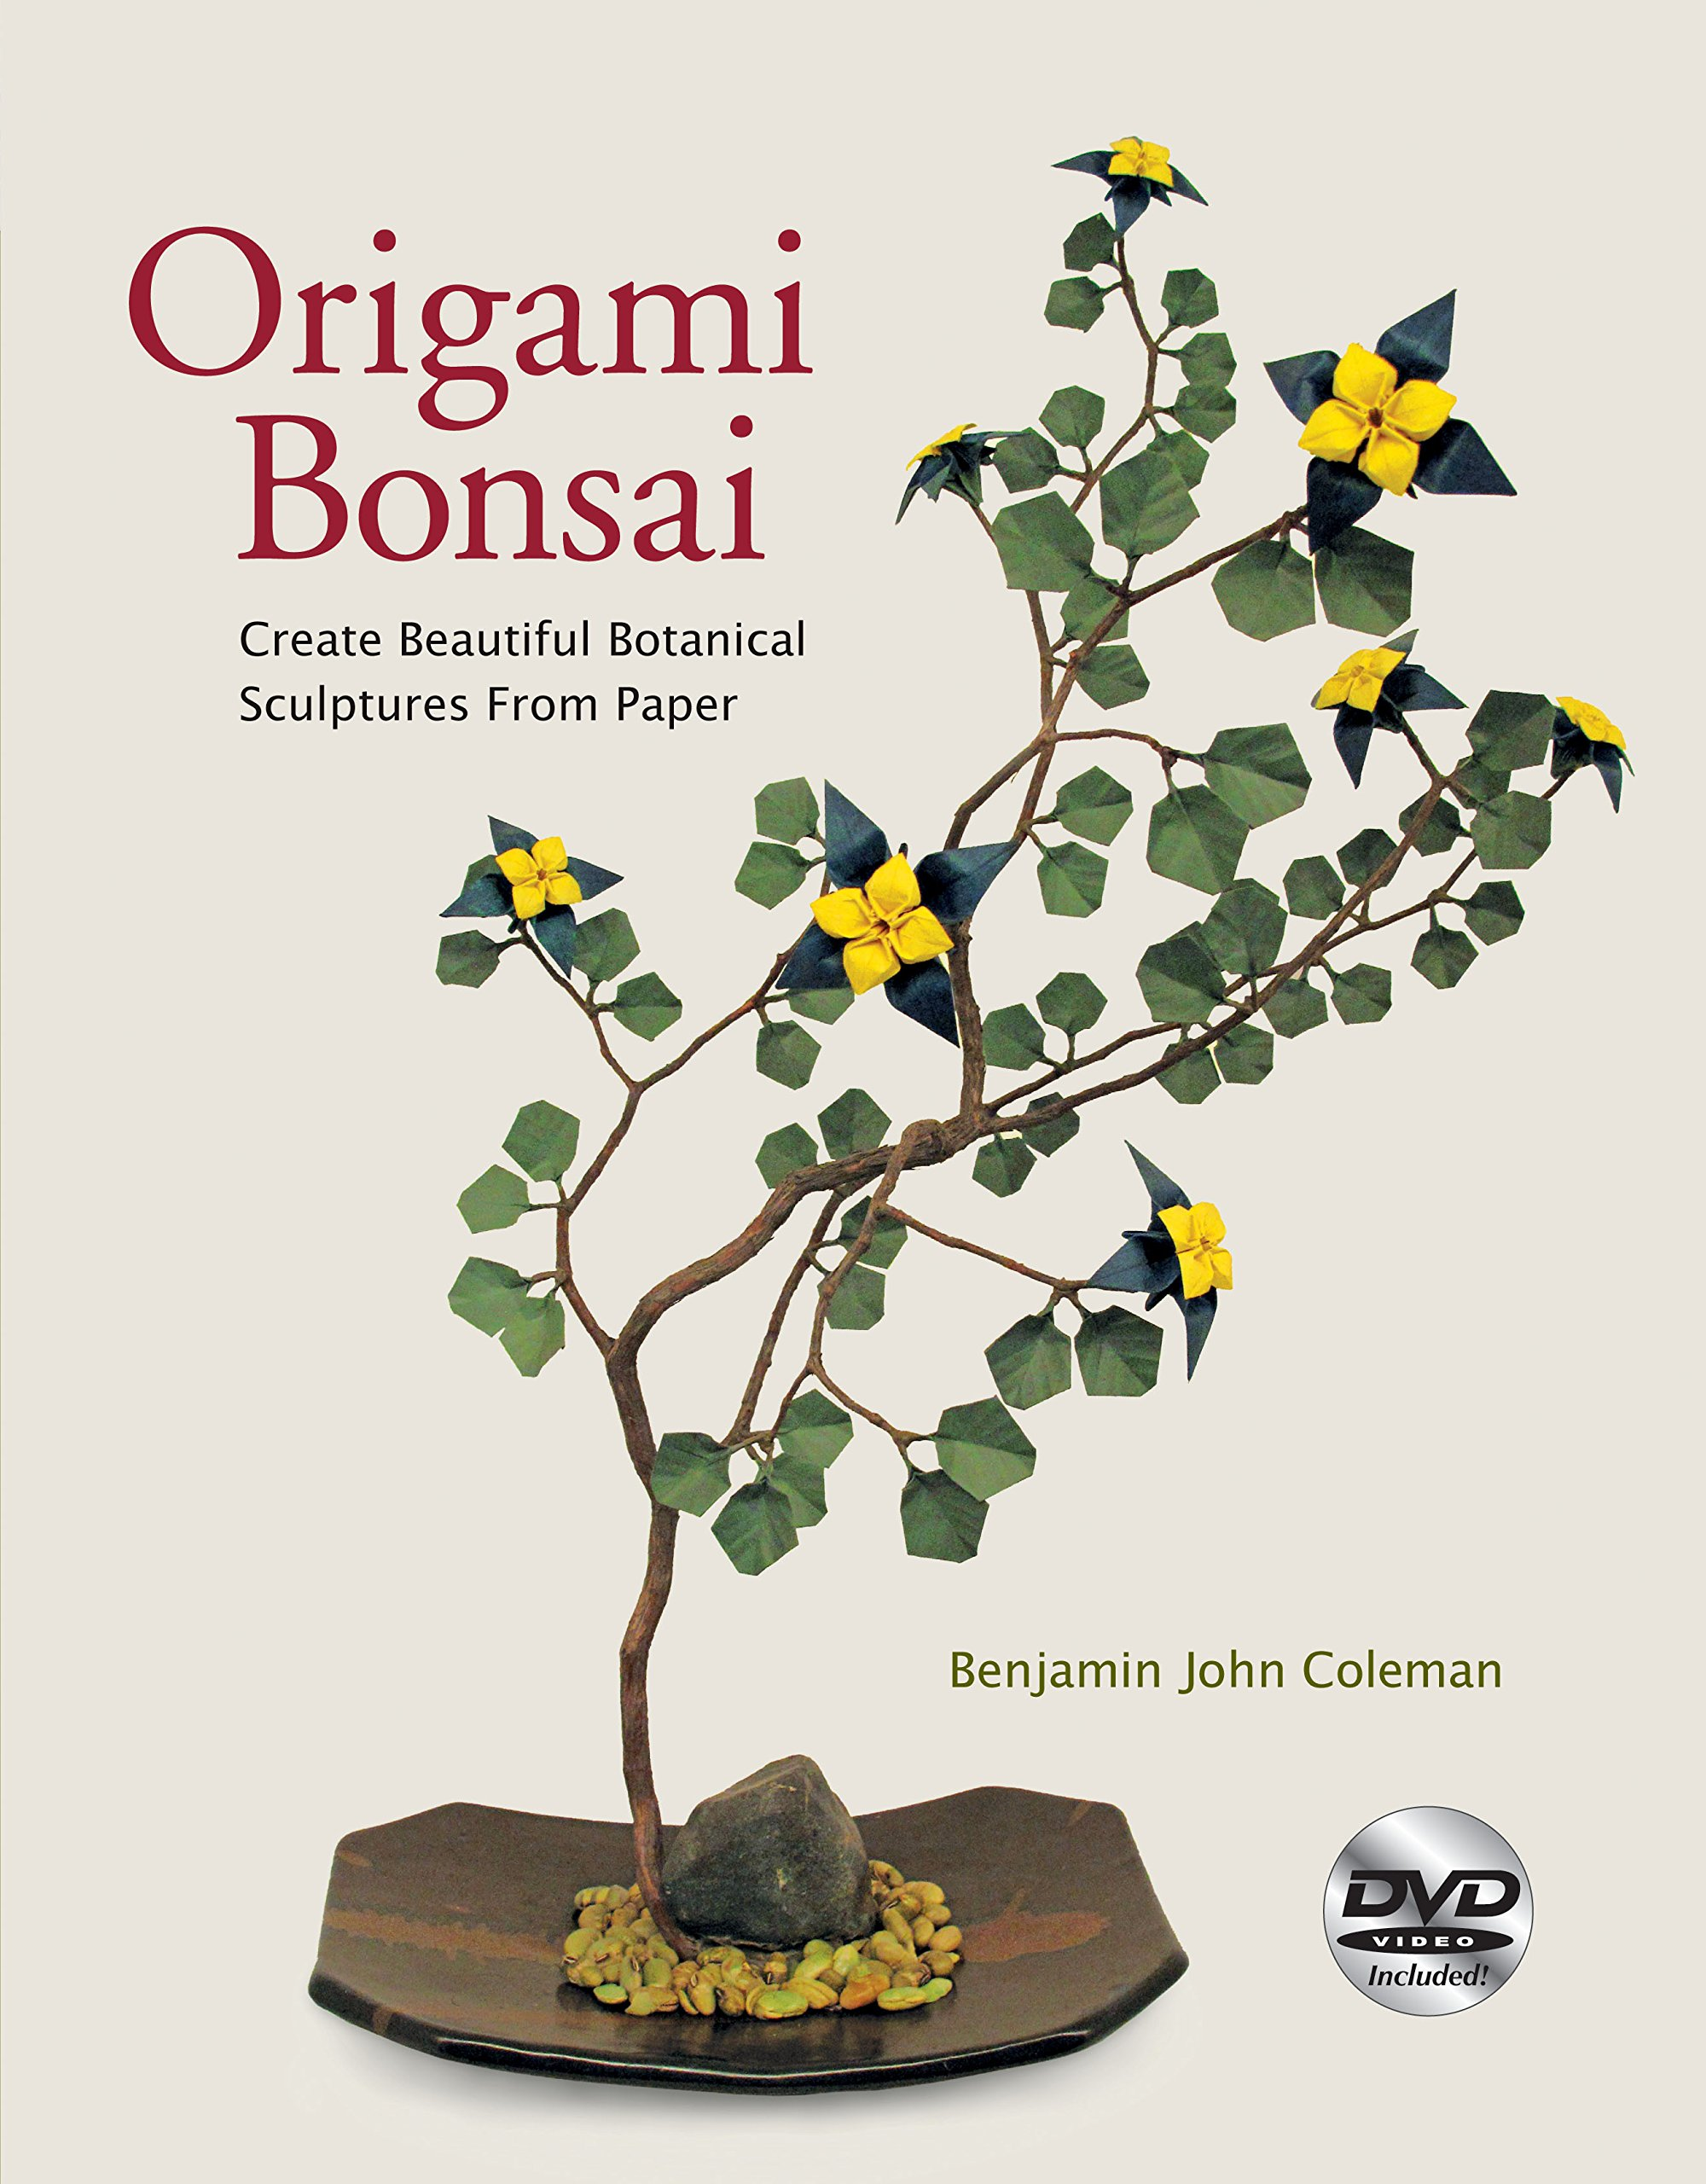 Origami Bonsai Create Beautiful Botanical Sculptures From Paper